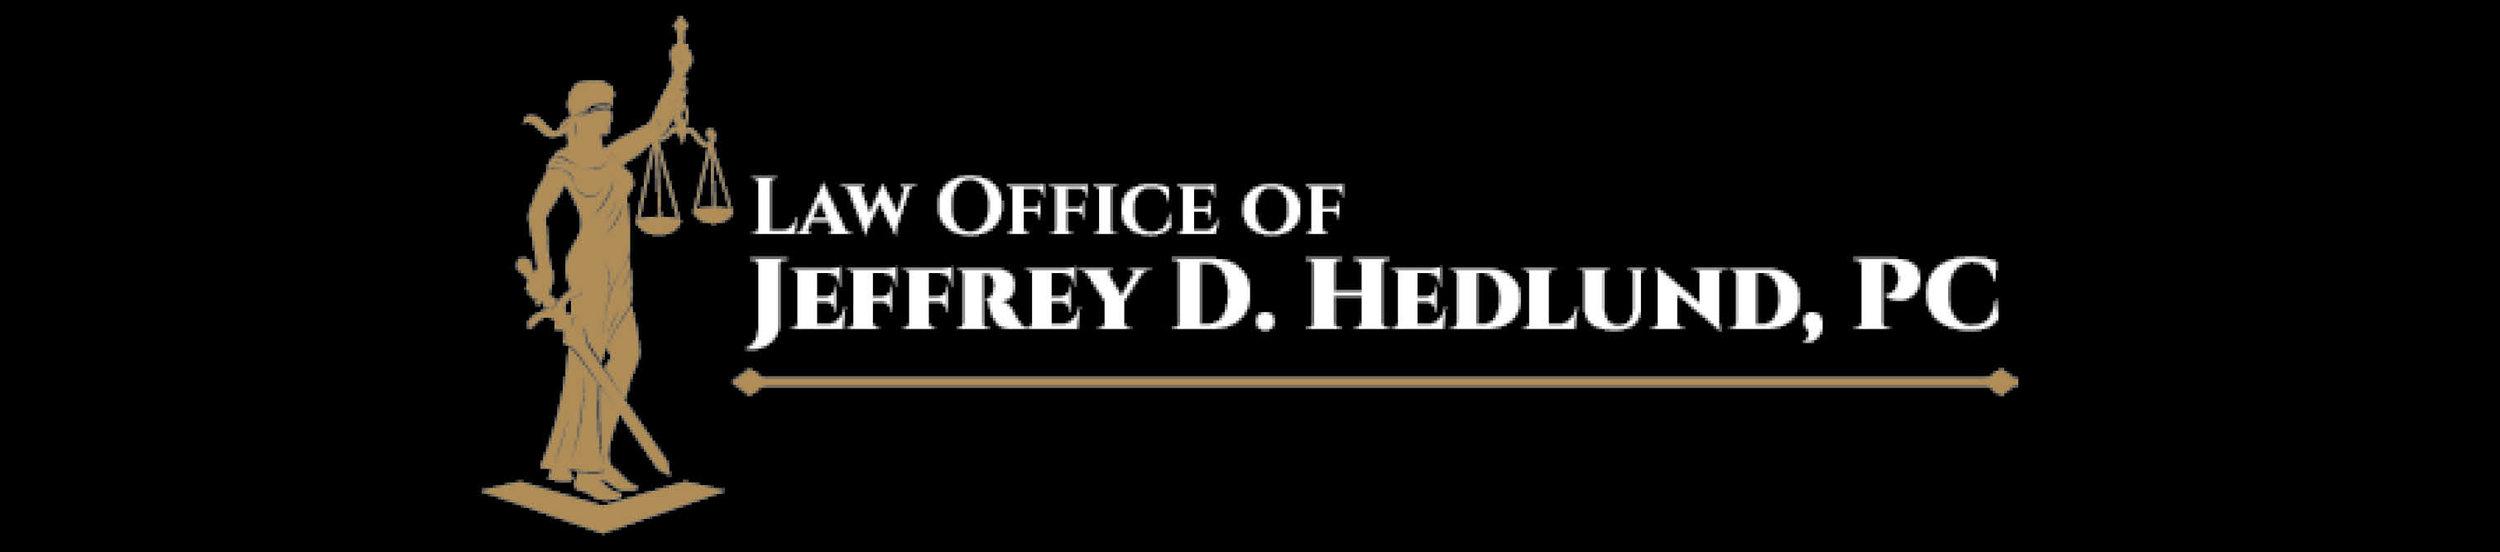 Jeffrey Headlund  Logo_Directory.jpg